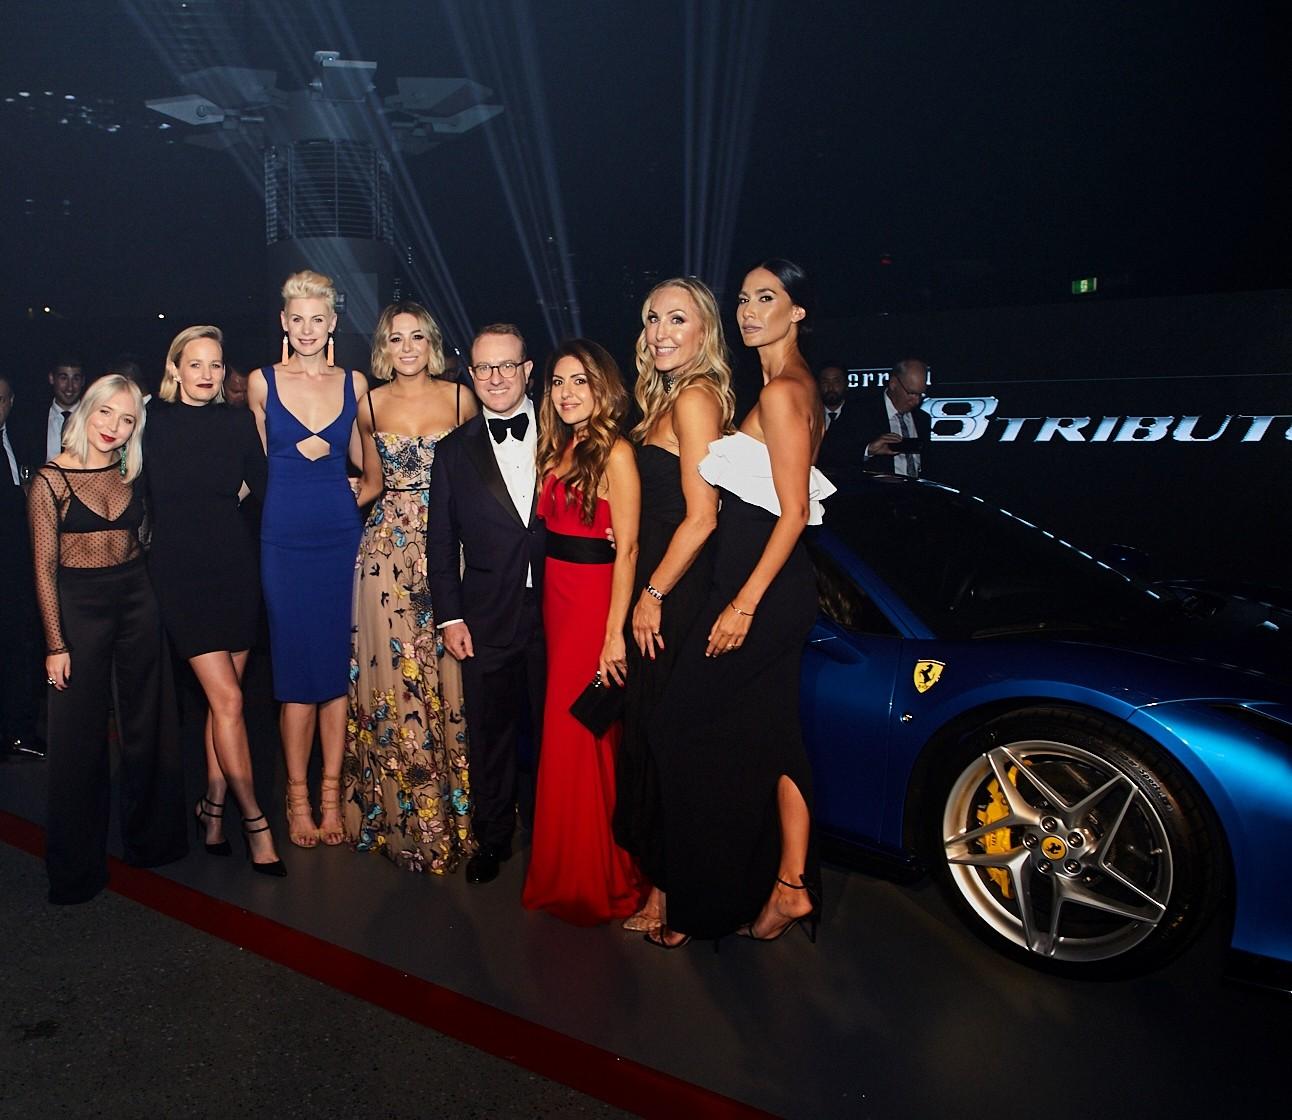 Ferrari F8 Tributo Rear: A Tribute To Ferrari's Success